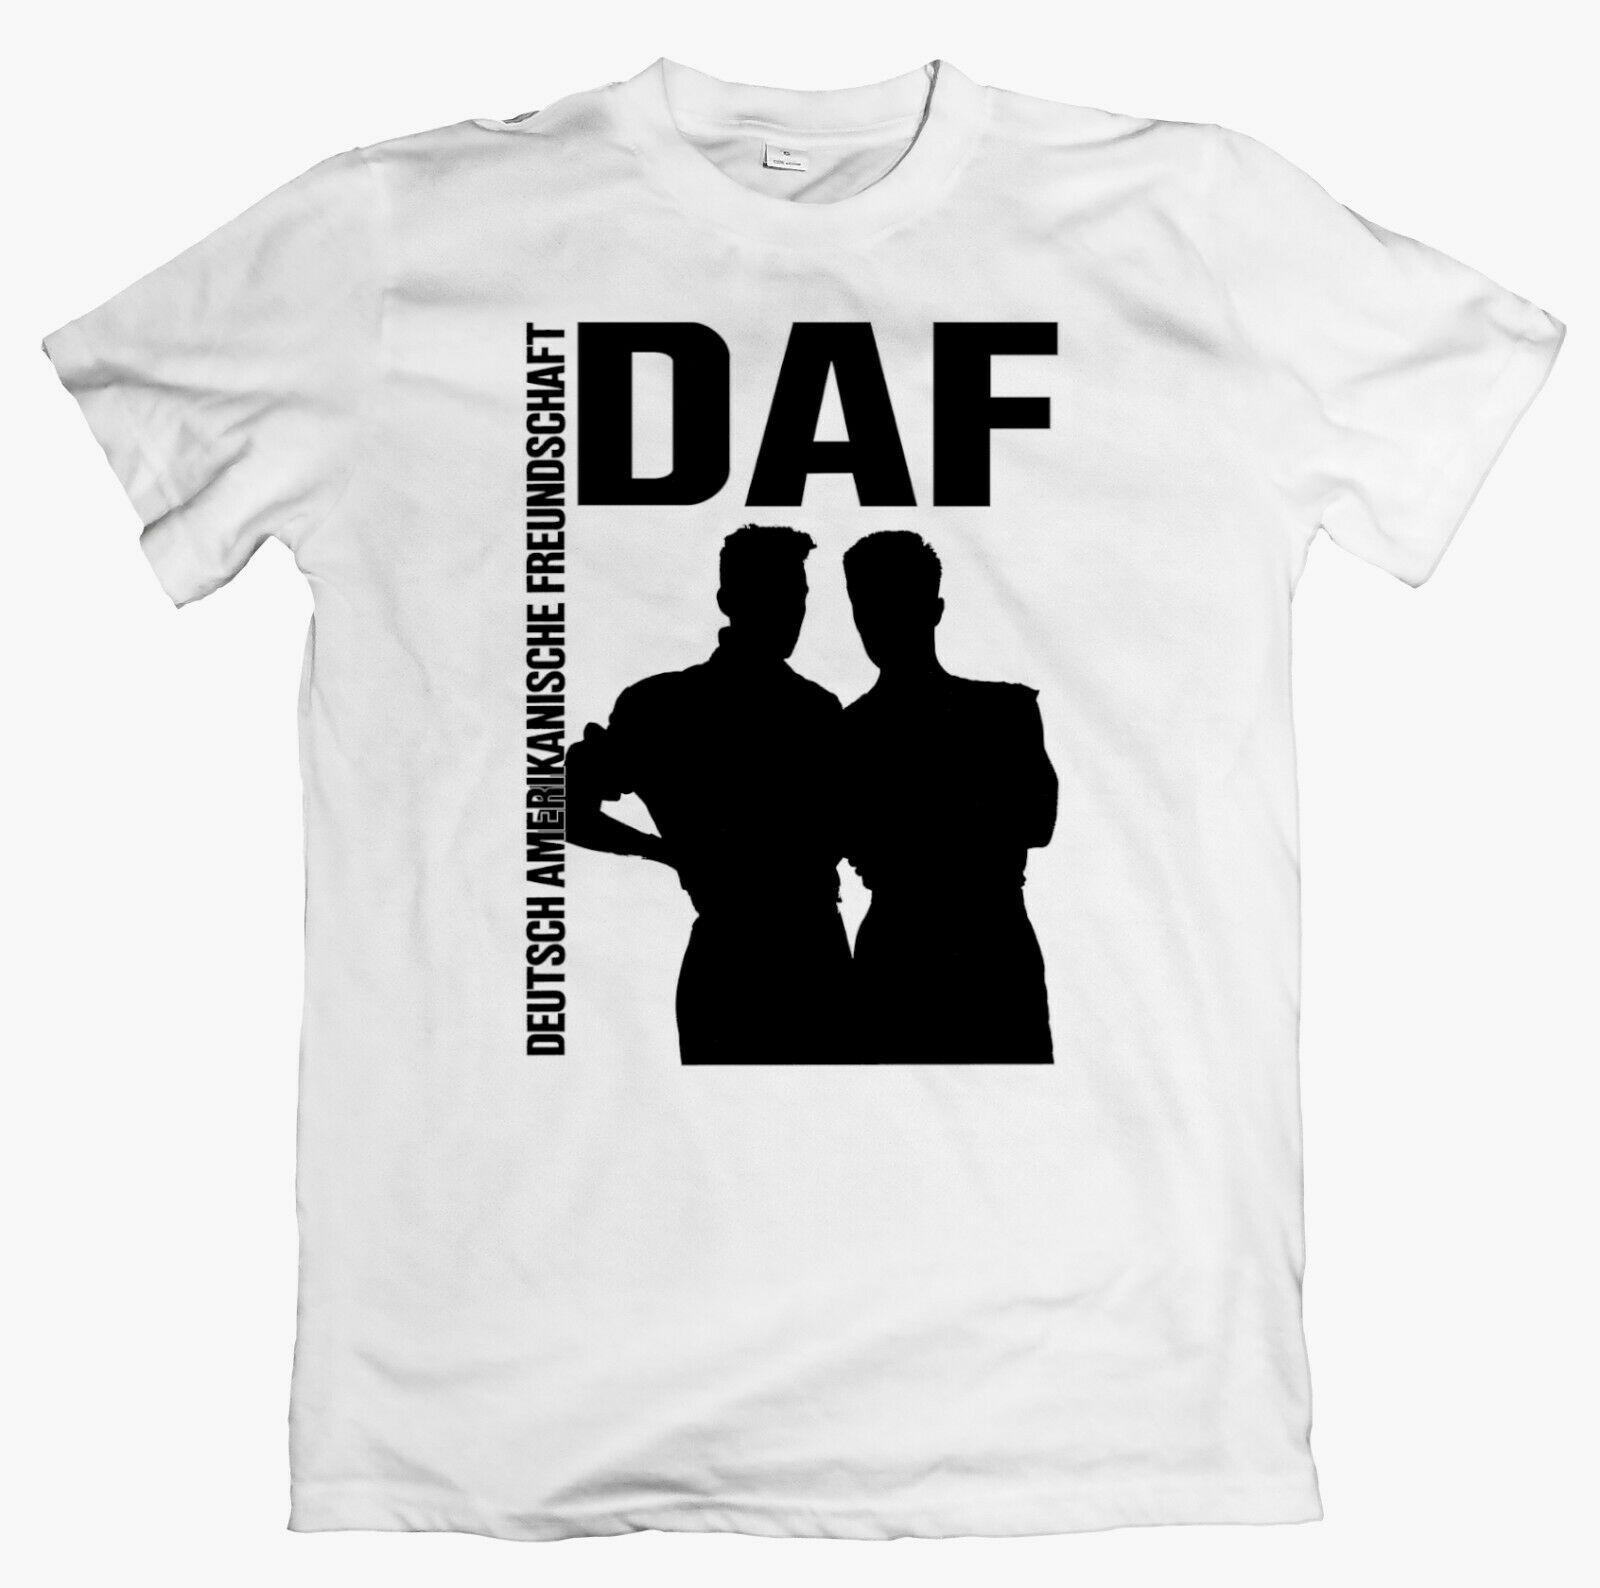 Daf camiseta Liaisons Dangereuses Nitzer marea frente 242 Grauzone... Spk Der Plan